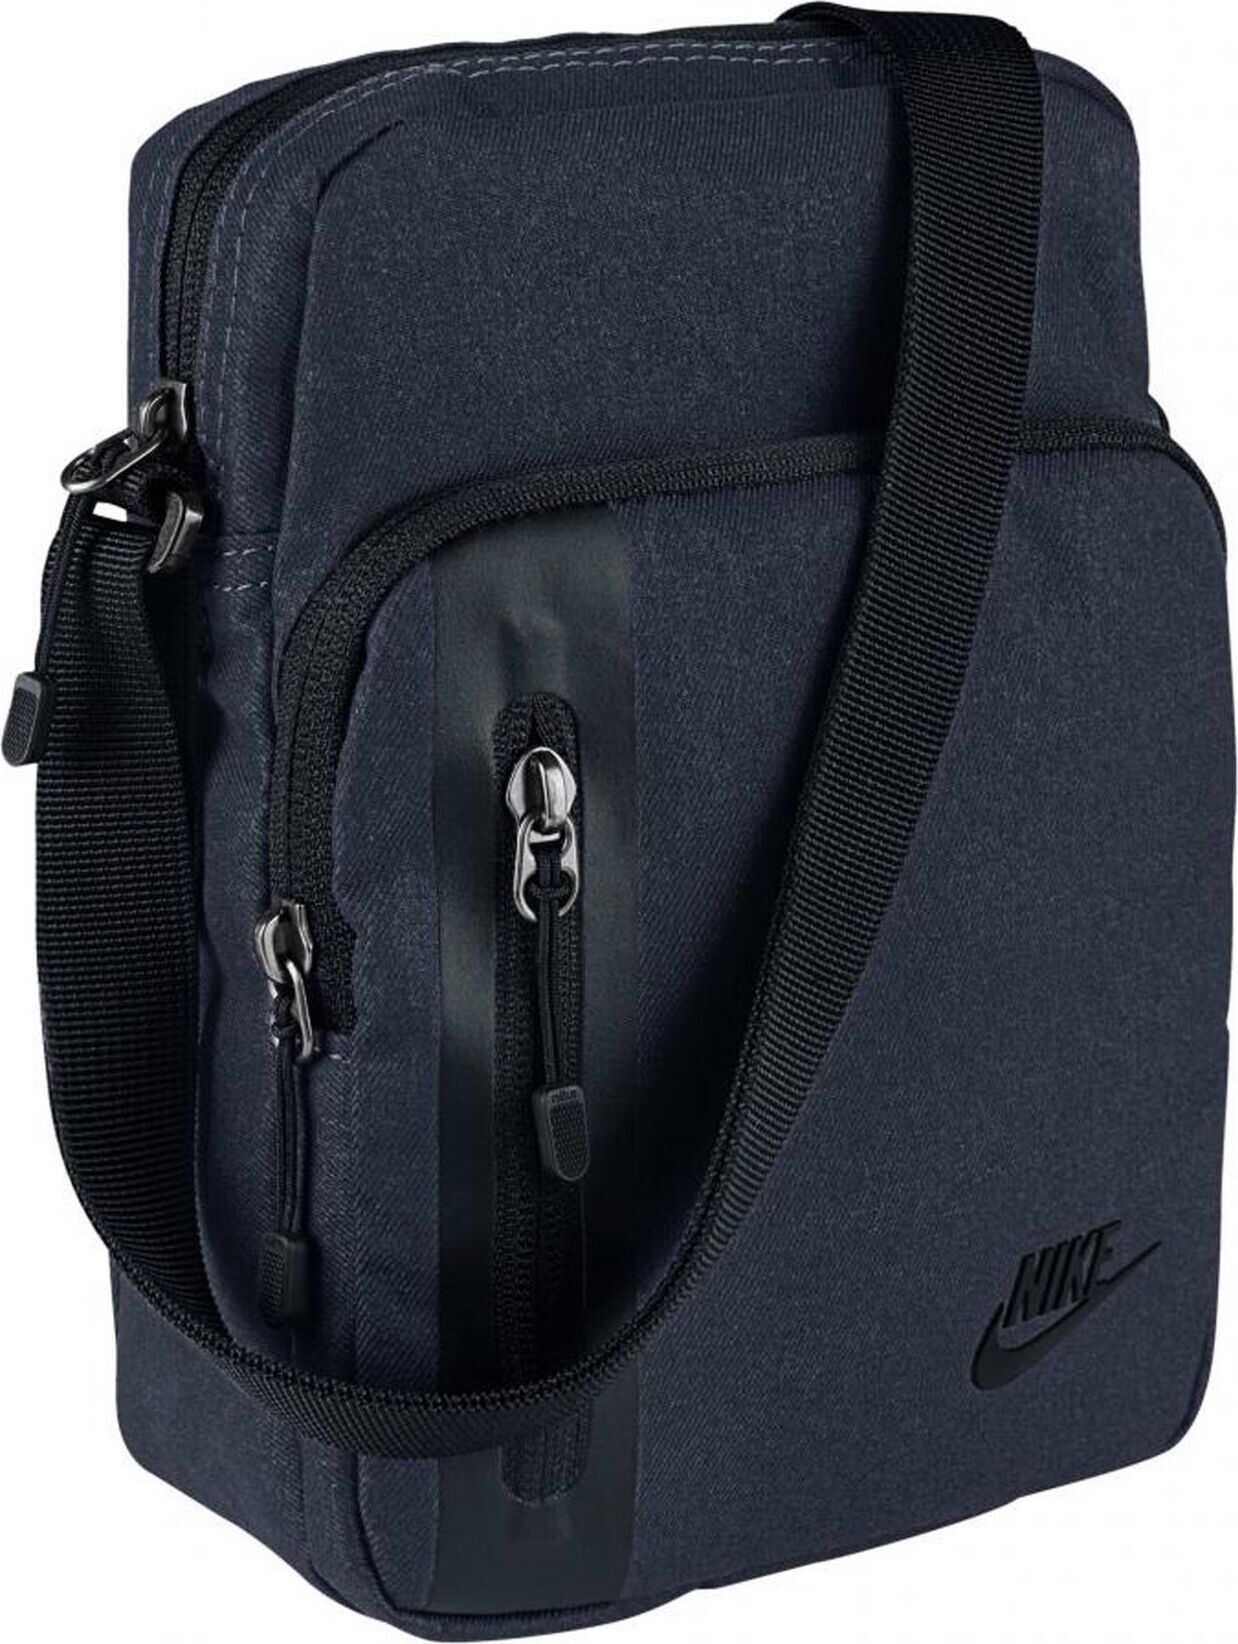 Nike CORE SMALL ITEMS 3.0 Bleumarin